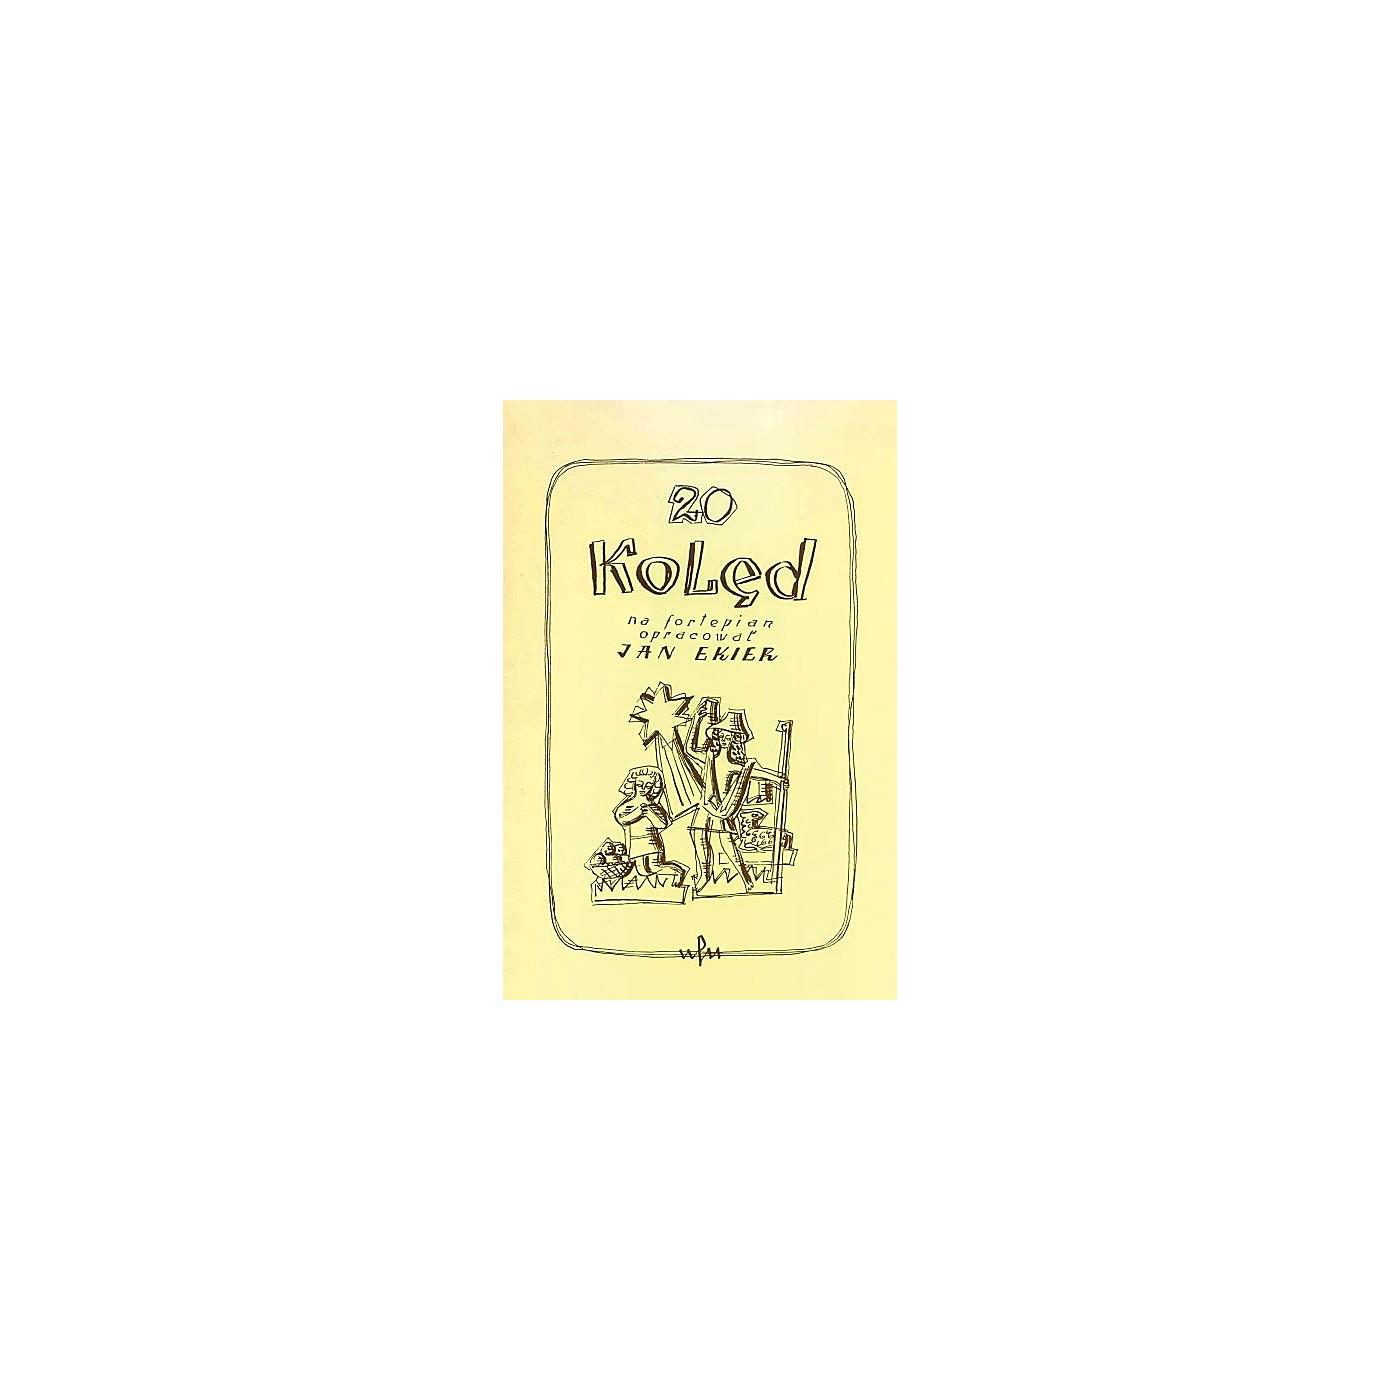 PWM 20 Koled na fortepian opracowar (Polish Language) PWM Series Softcover thumbnail